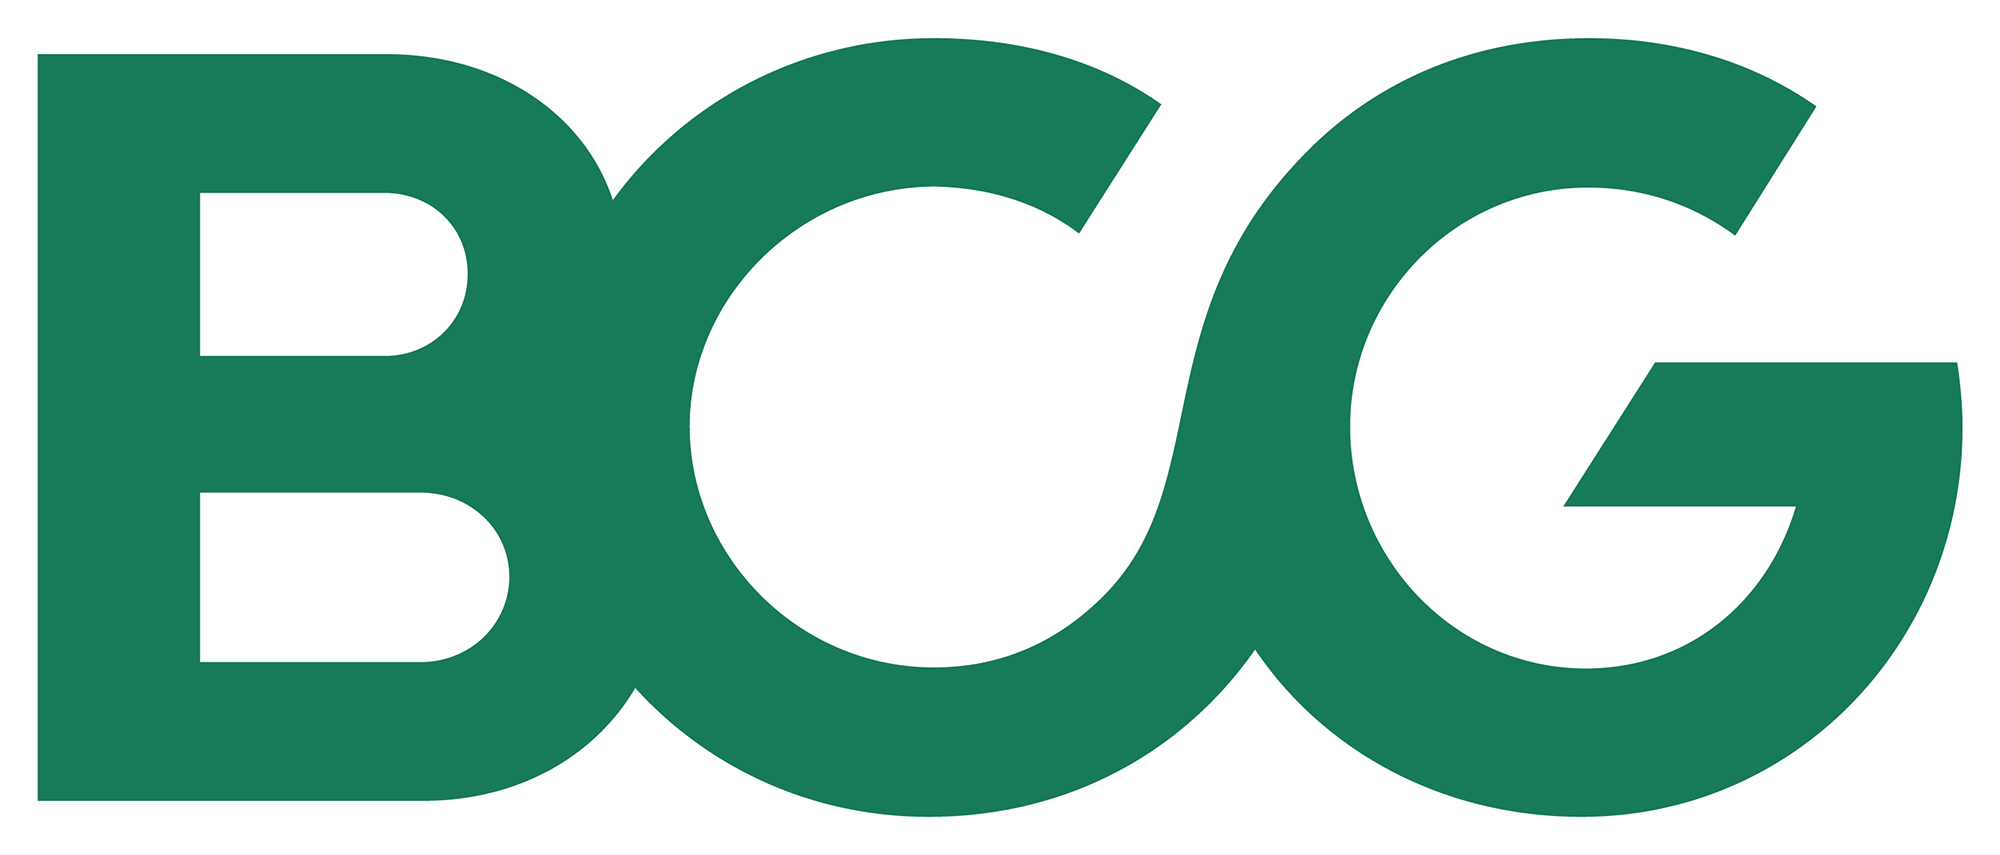 boston_consulting_group_logo_monogram